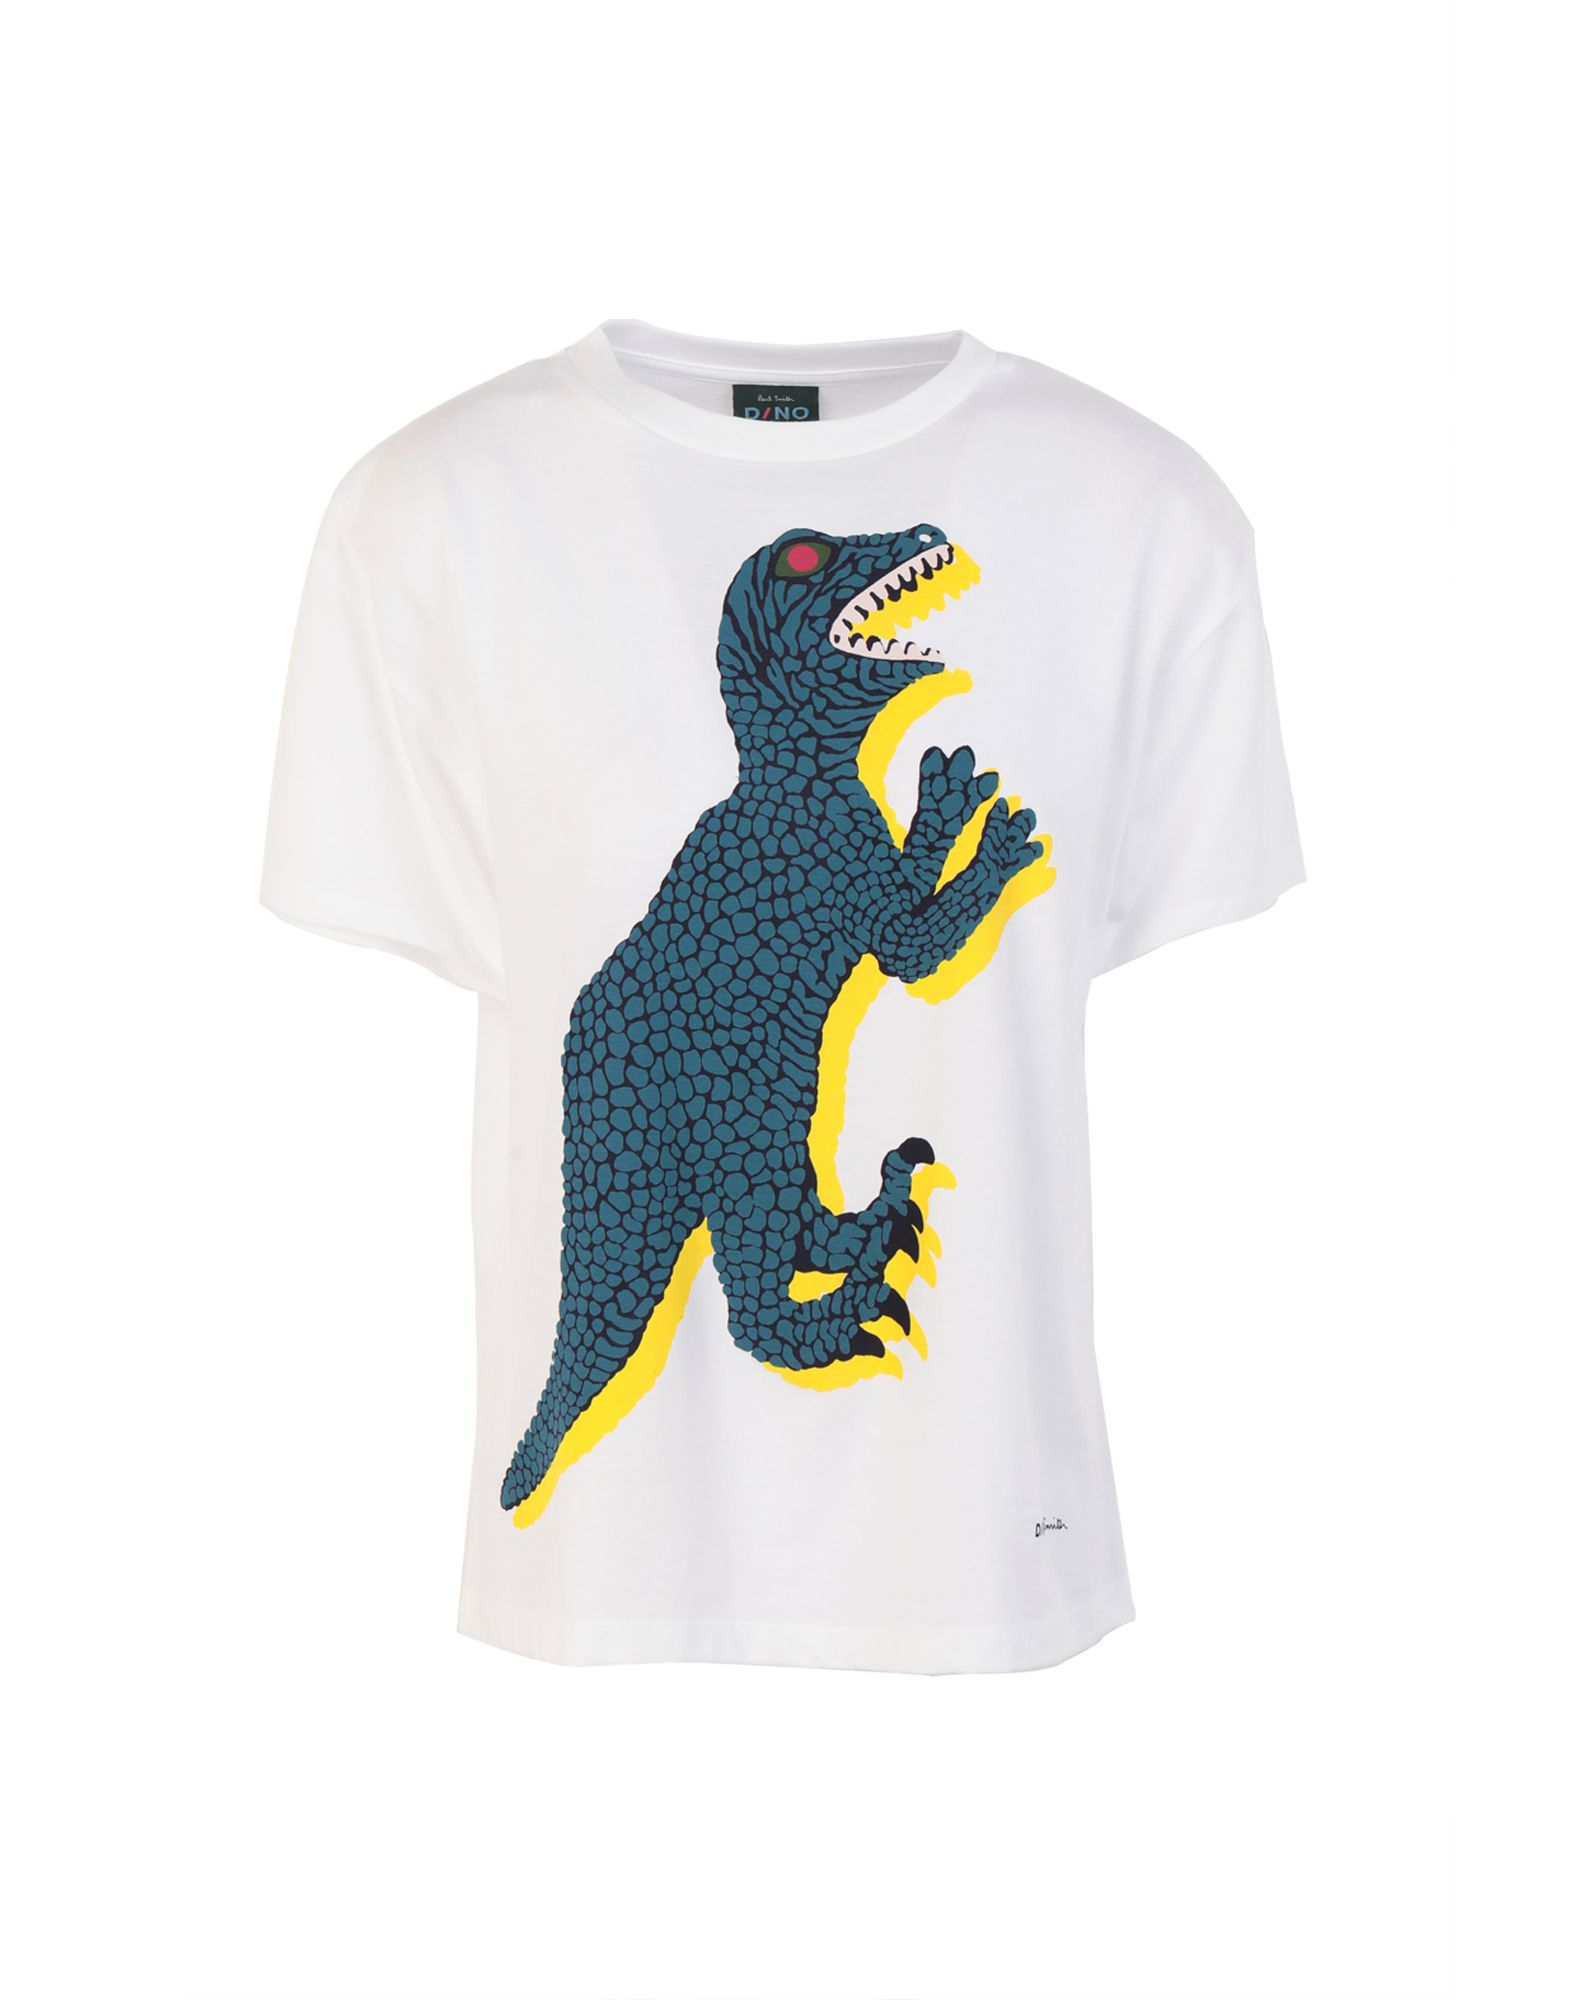 PAUL SMITH Футболка paul smith exclusively for yoox футболка